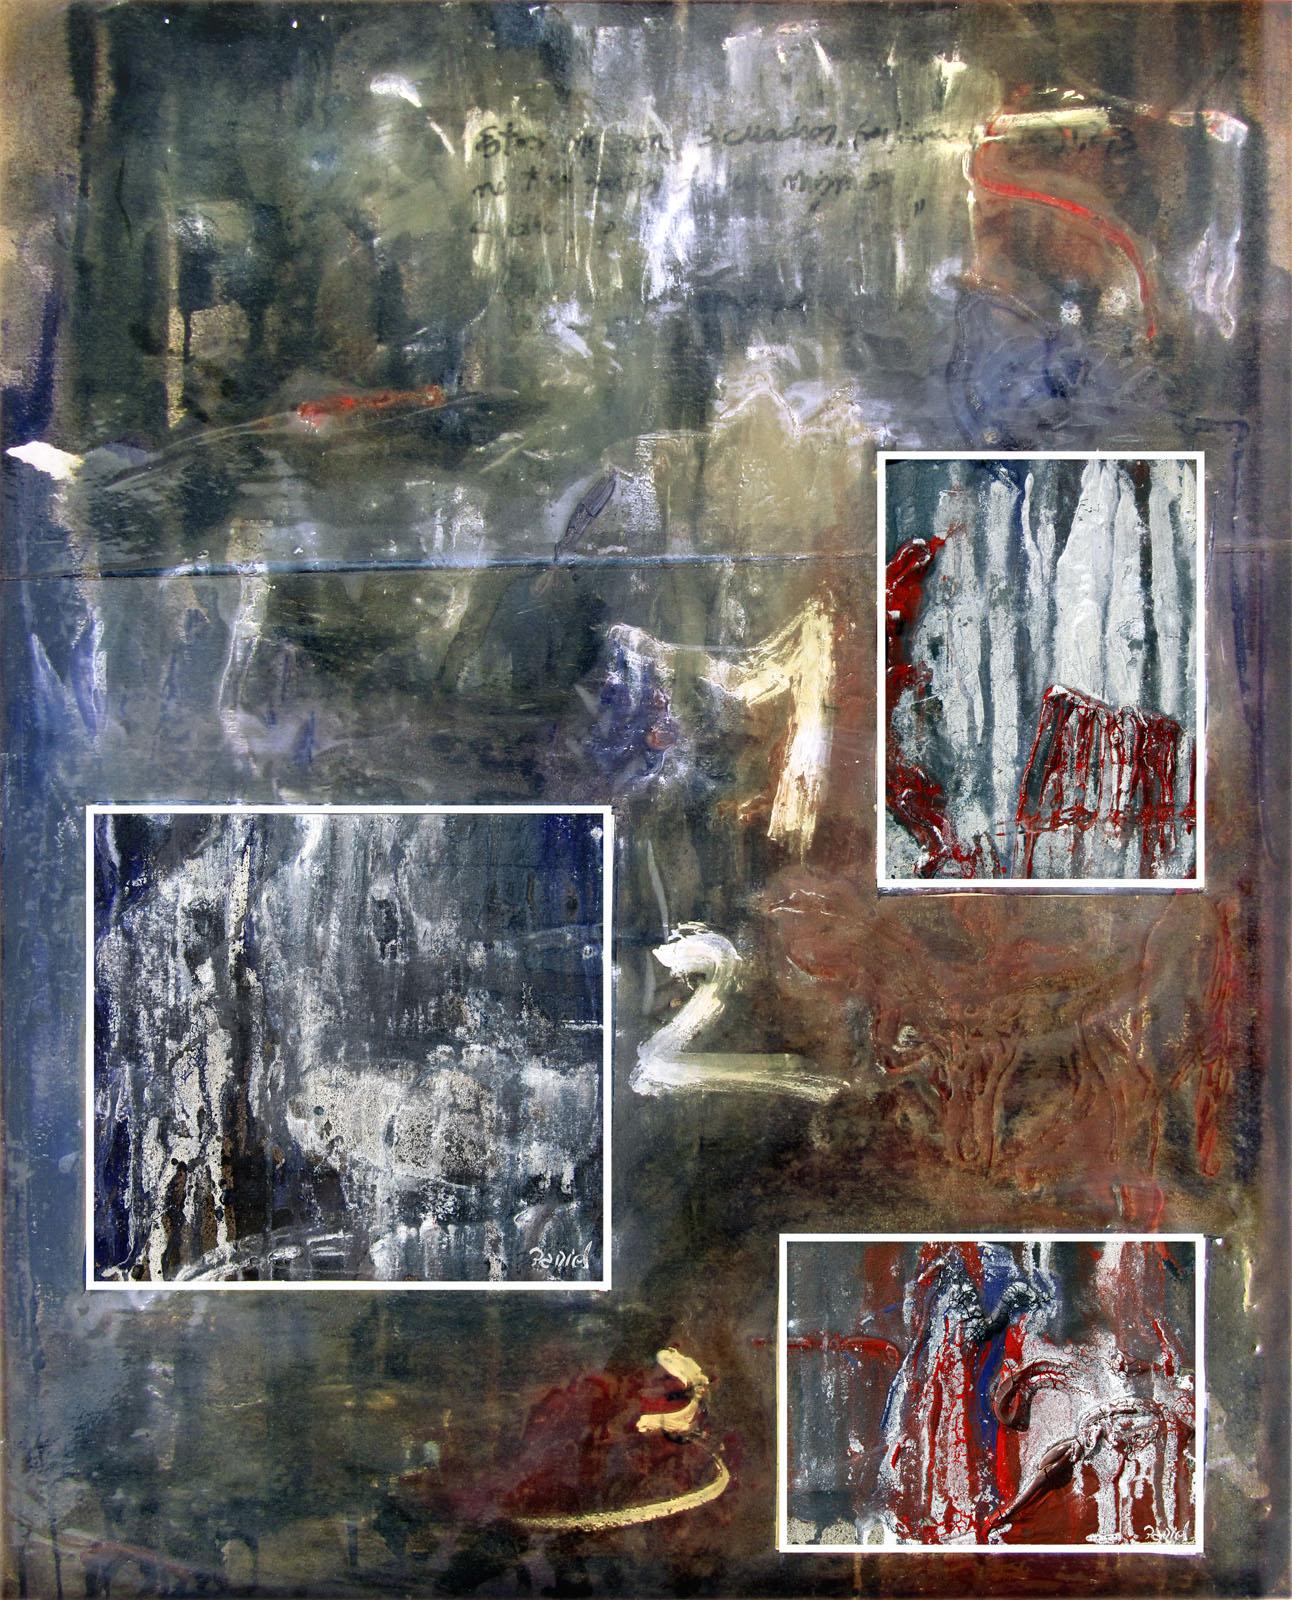 panies-danielvillalobos-spanish-painting-abstractexpressionism-25